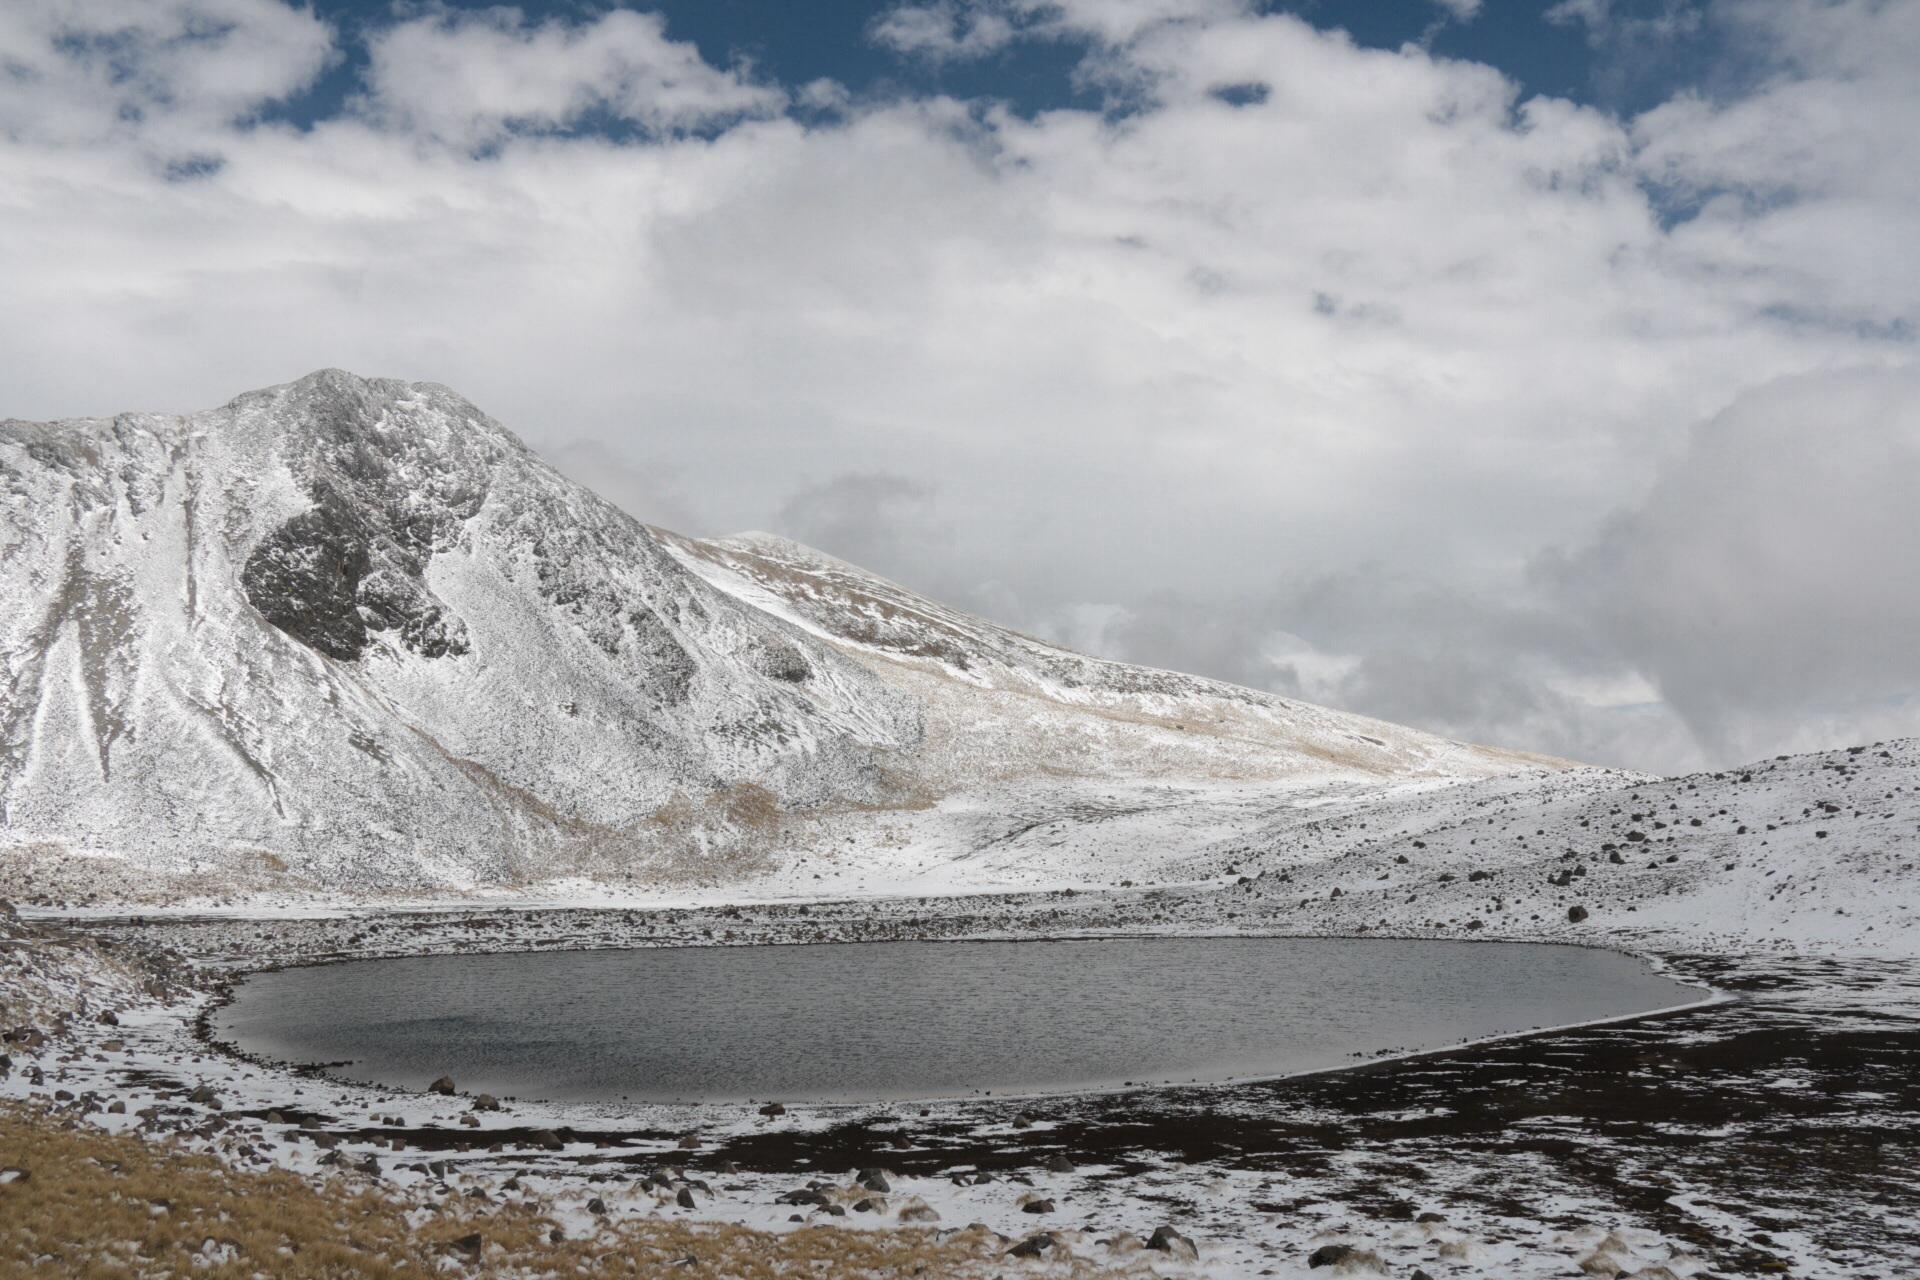 13- Le volcan Nevado de Toluca